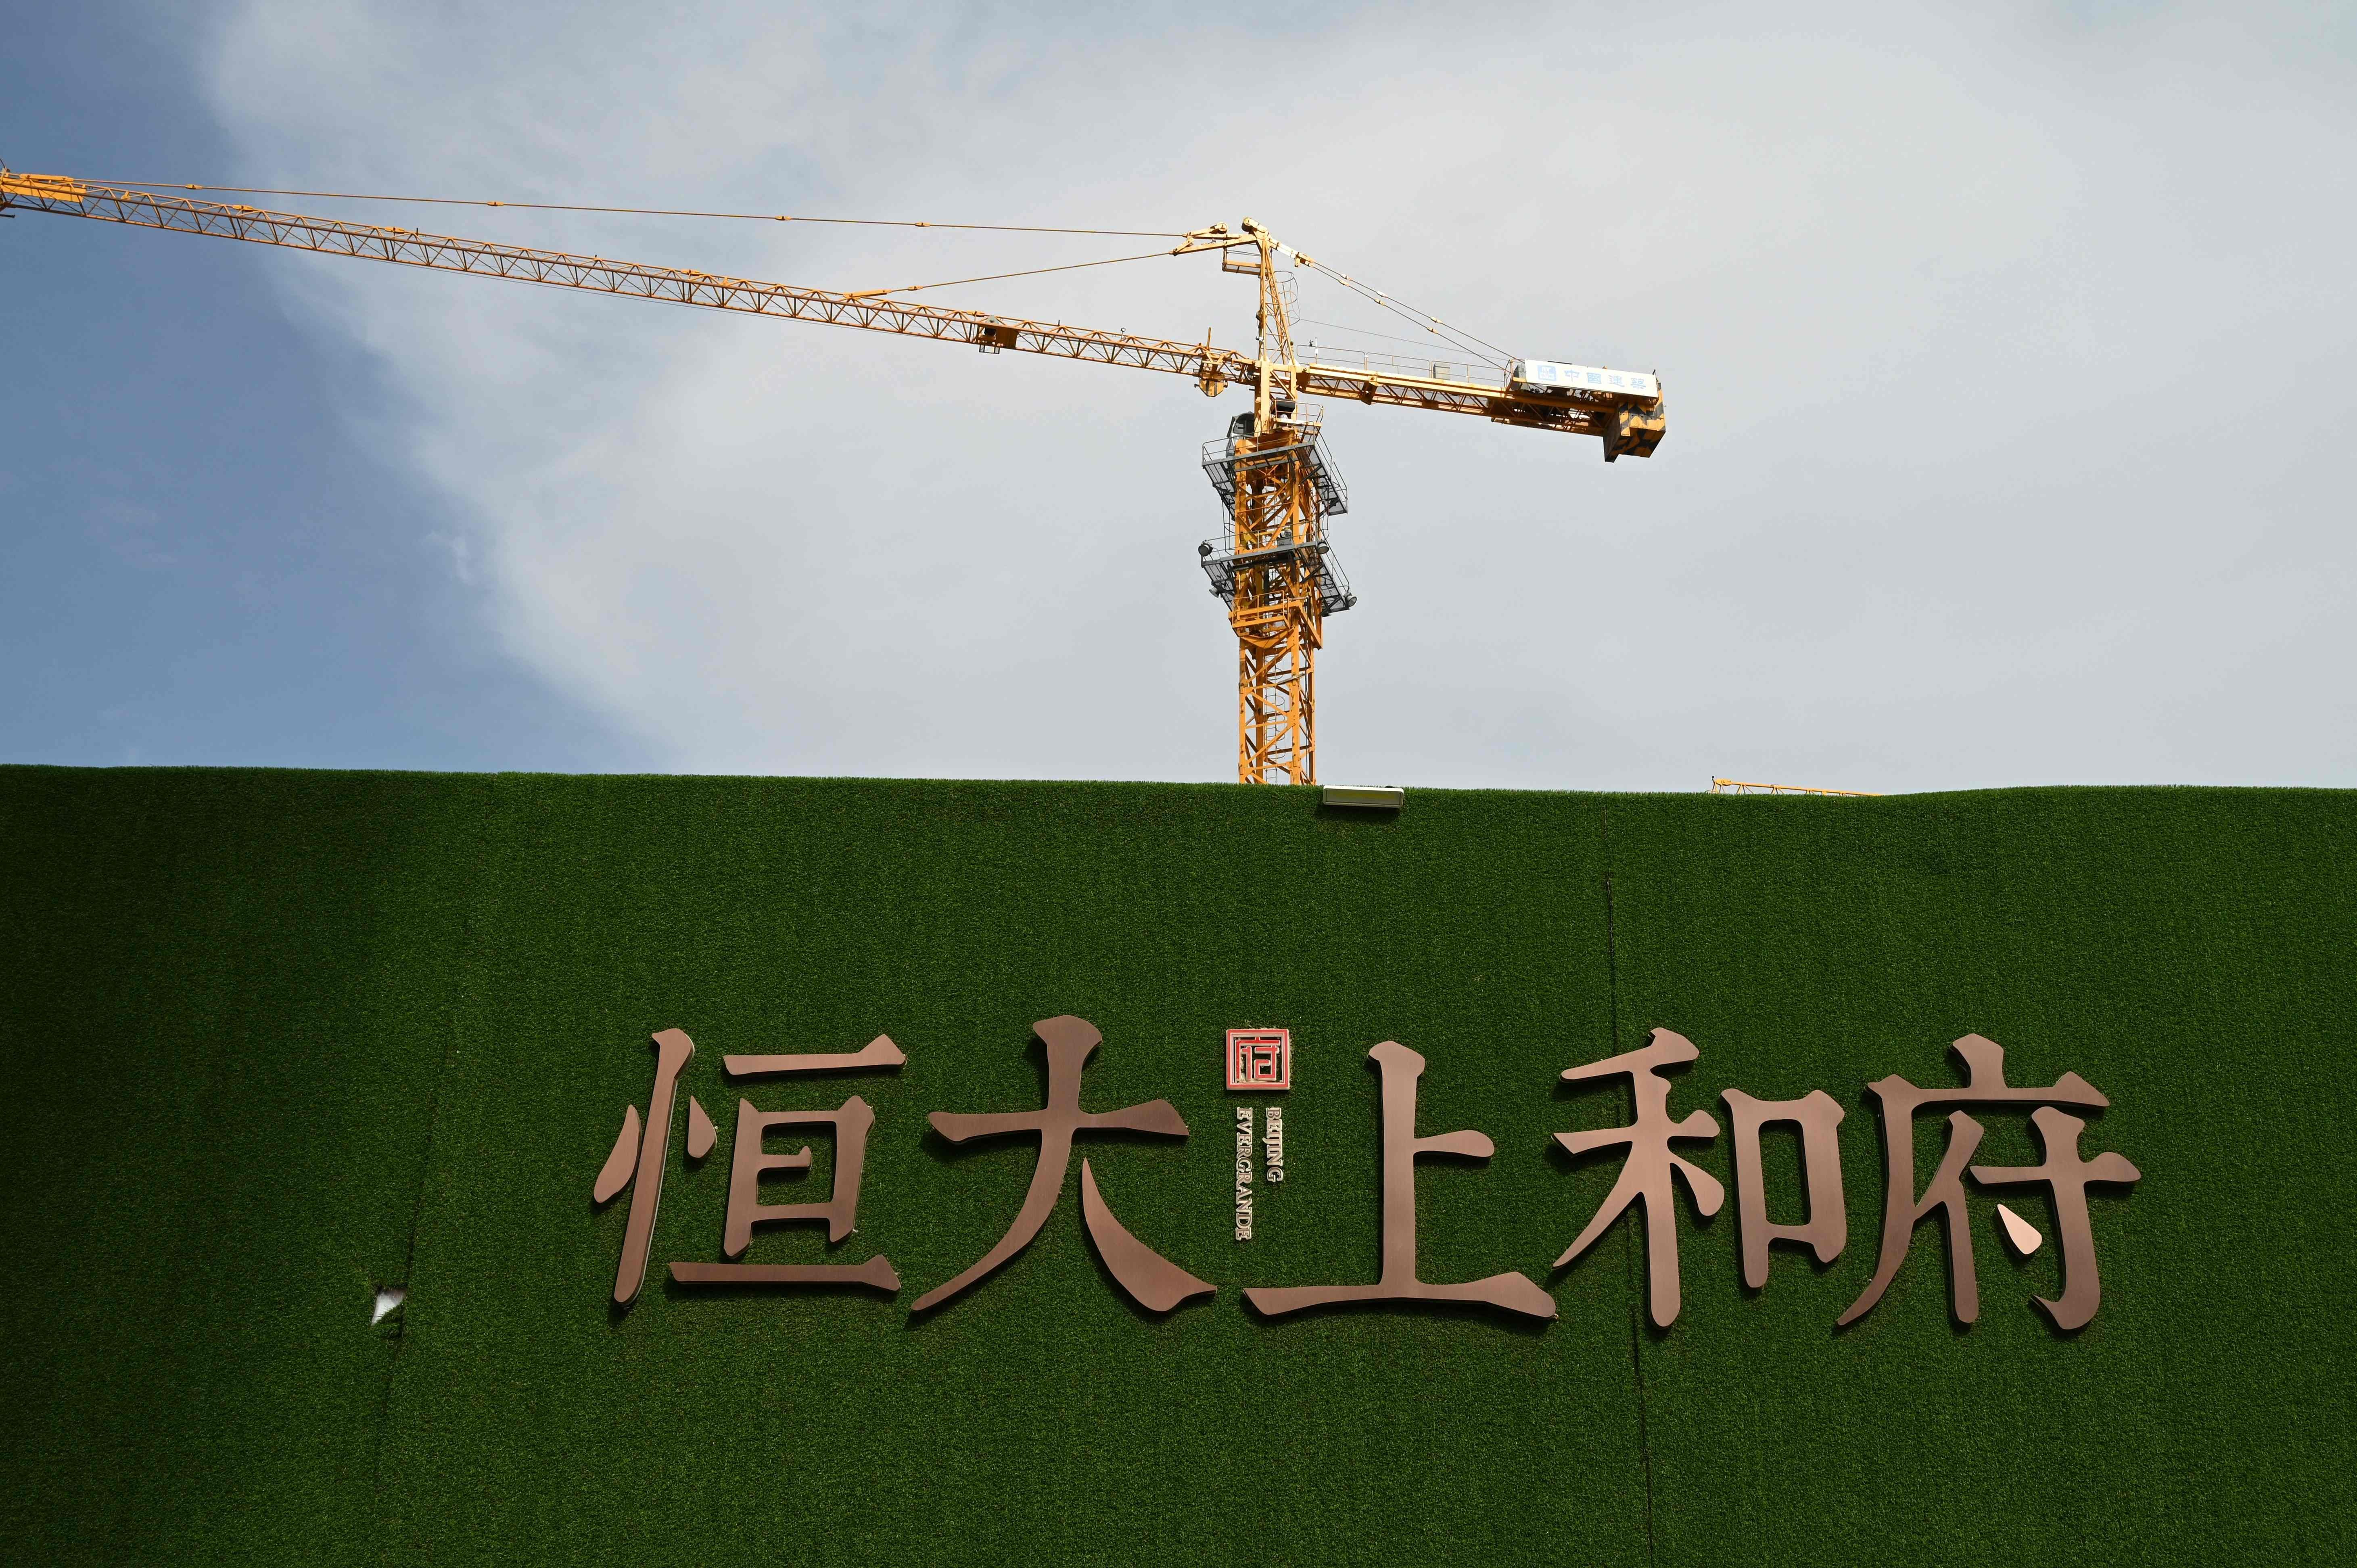 Chinese developer Evergrande denies bankruptcy rumors as protests mount